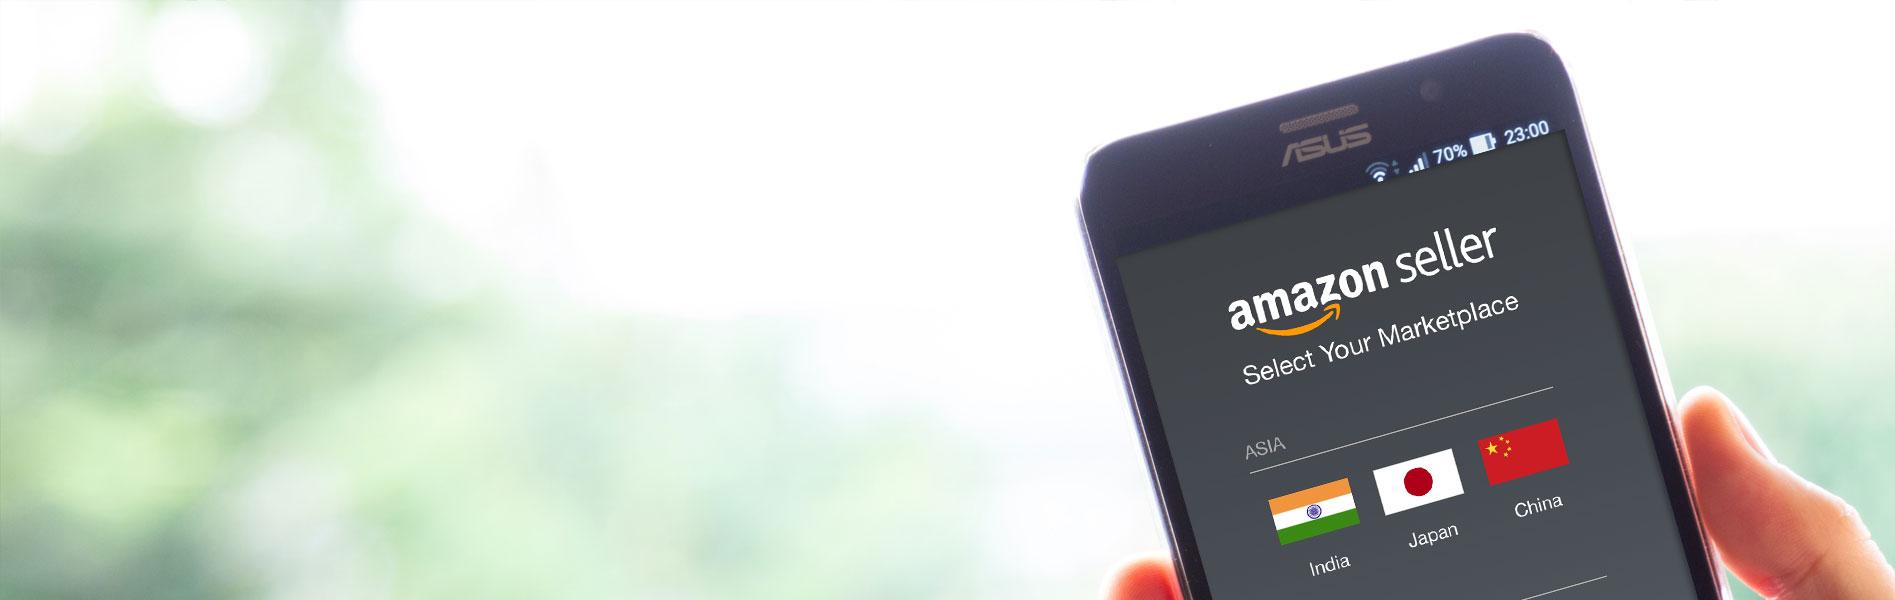 Amazon-Consultant